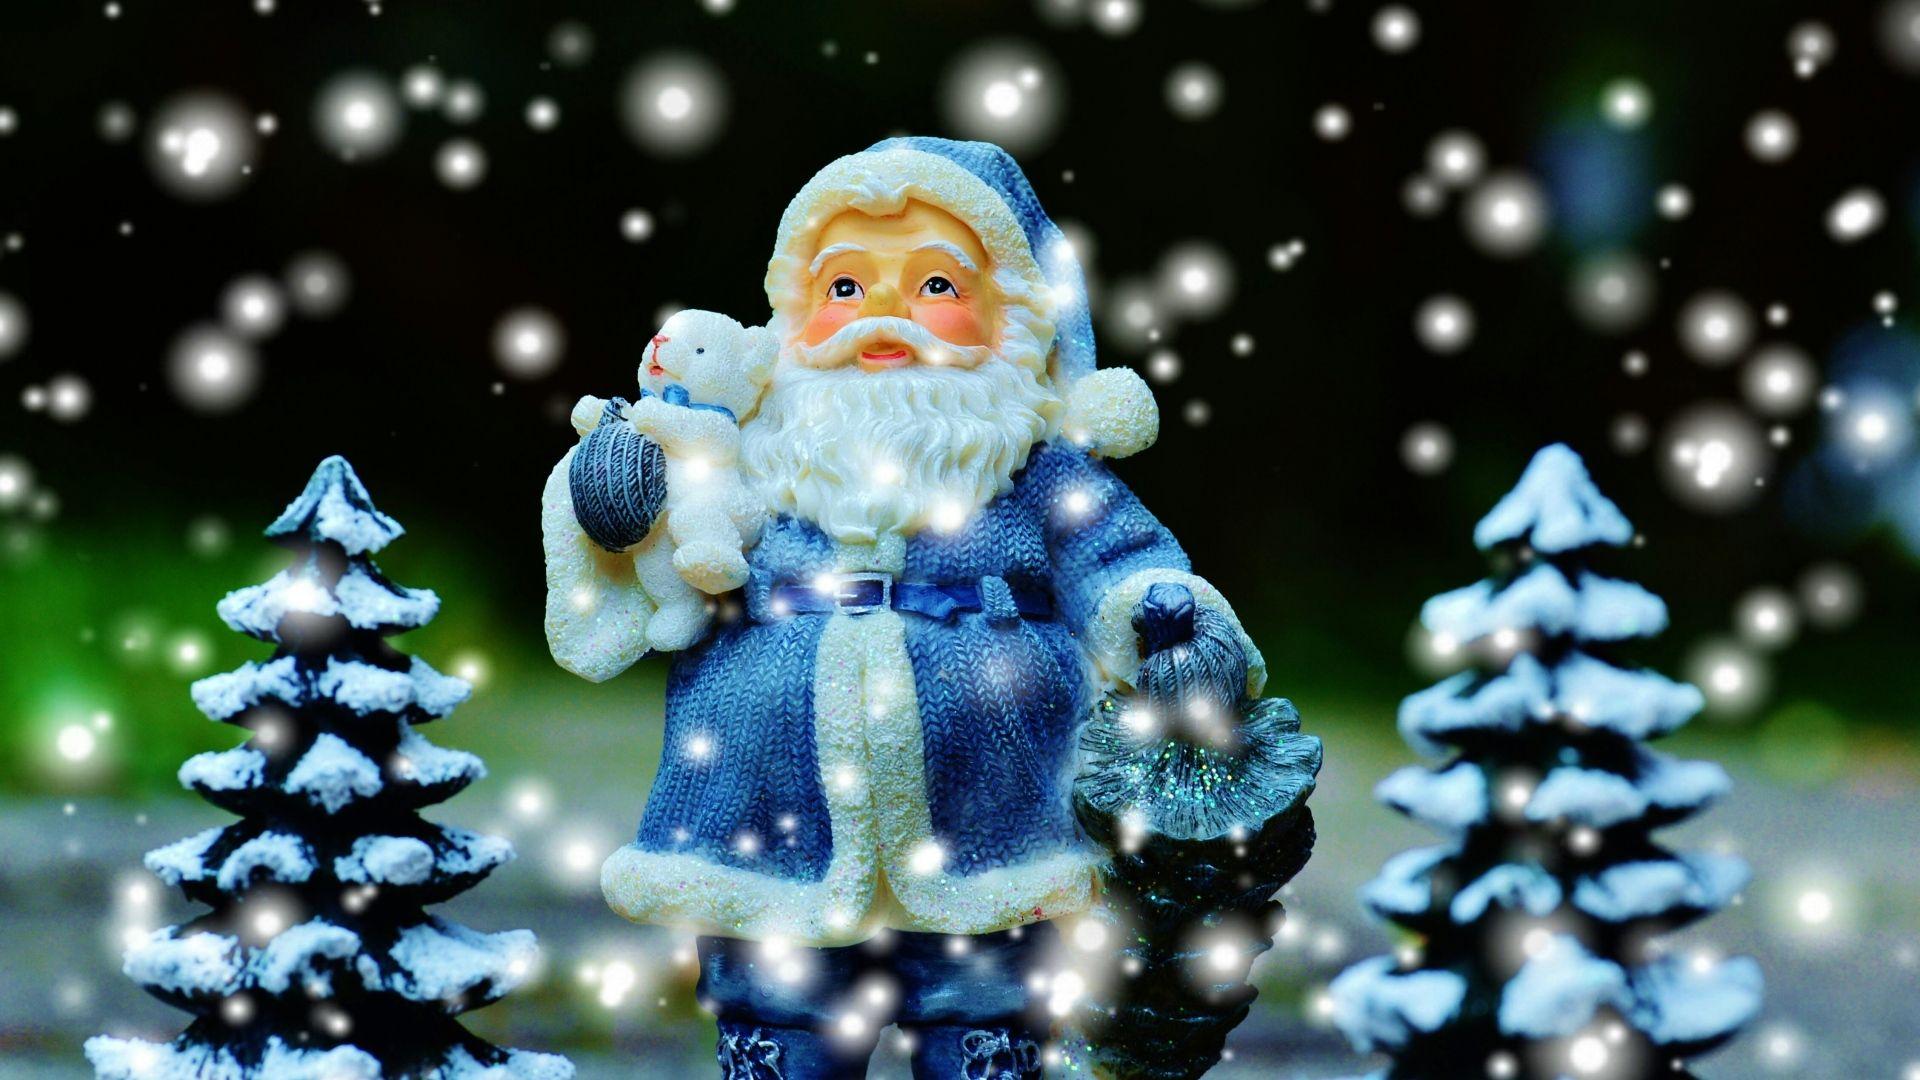 1920x1080 Wallpaper Santa Claus Christmas Trees New Year